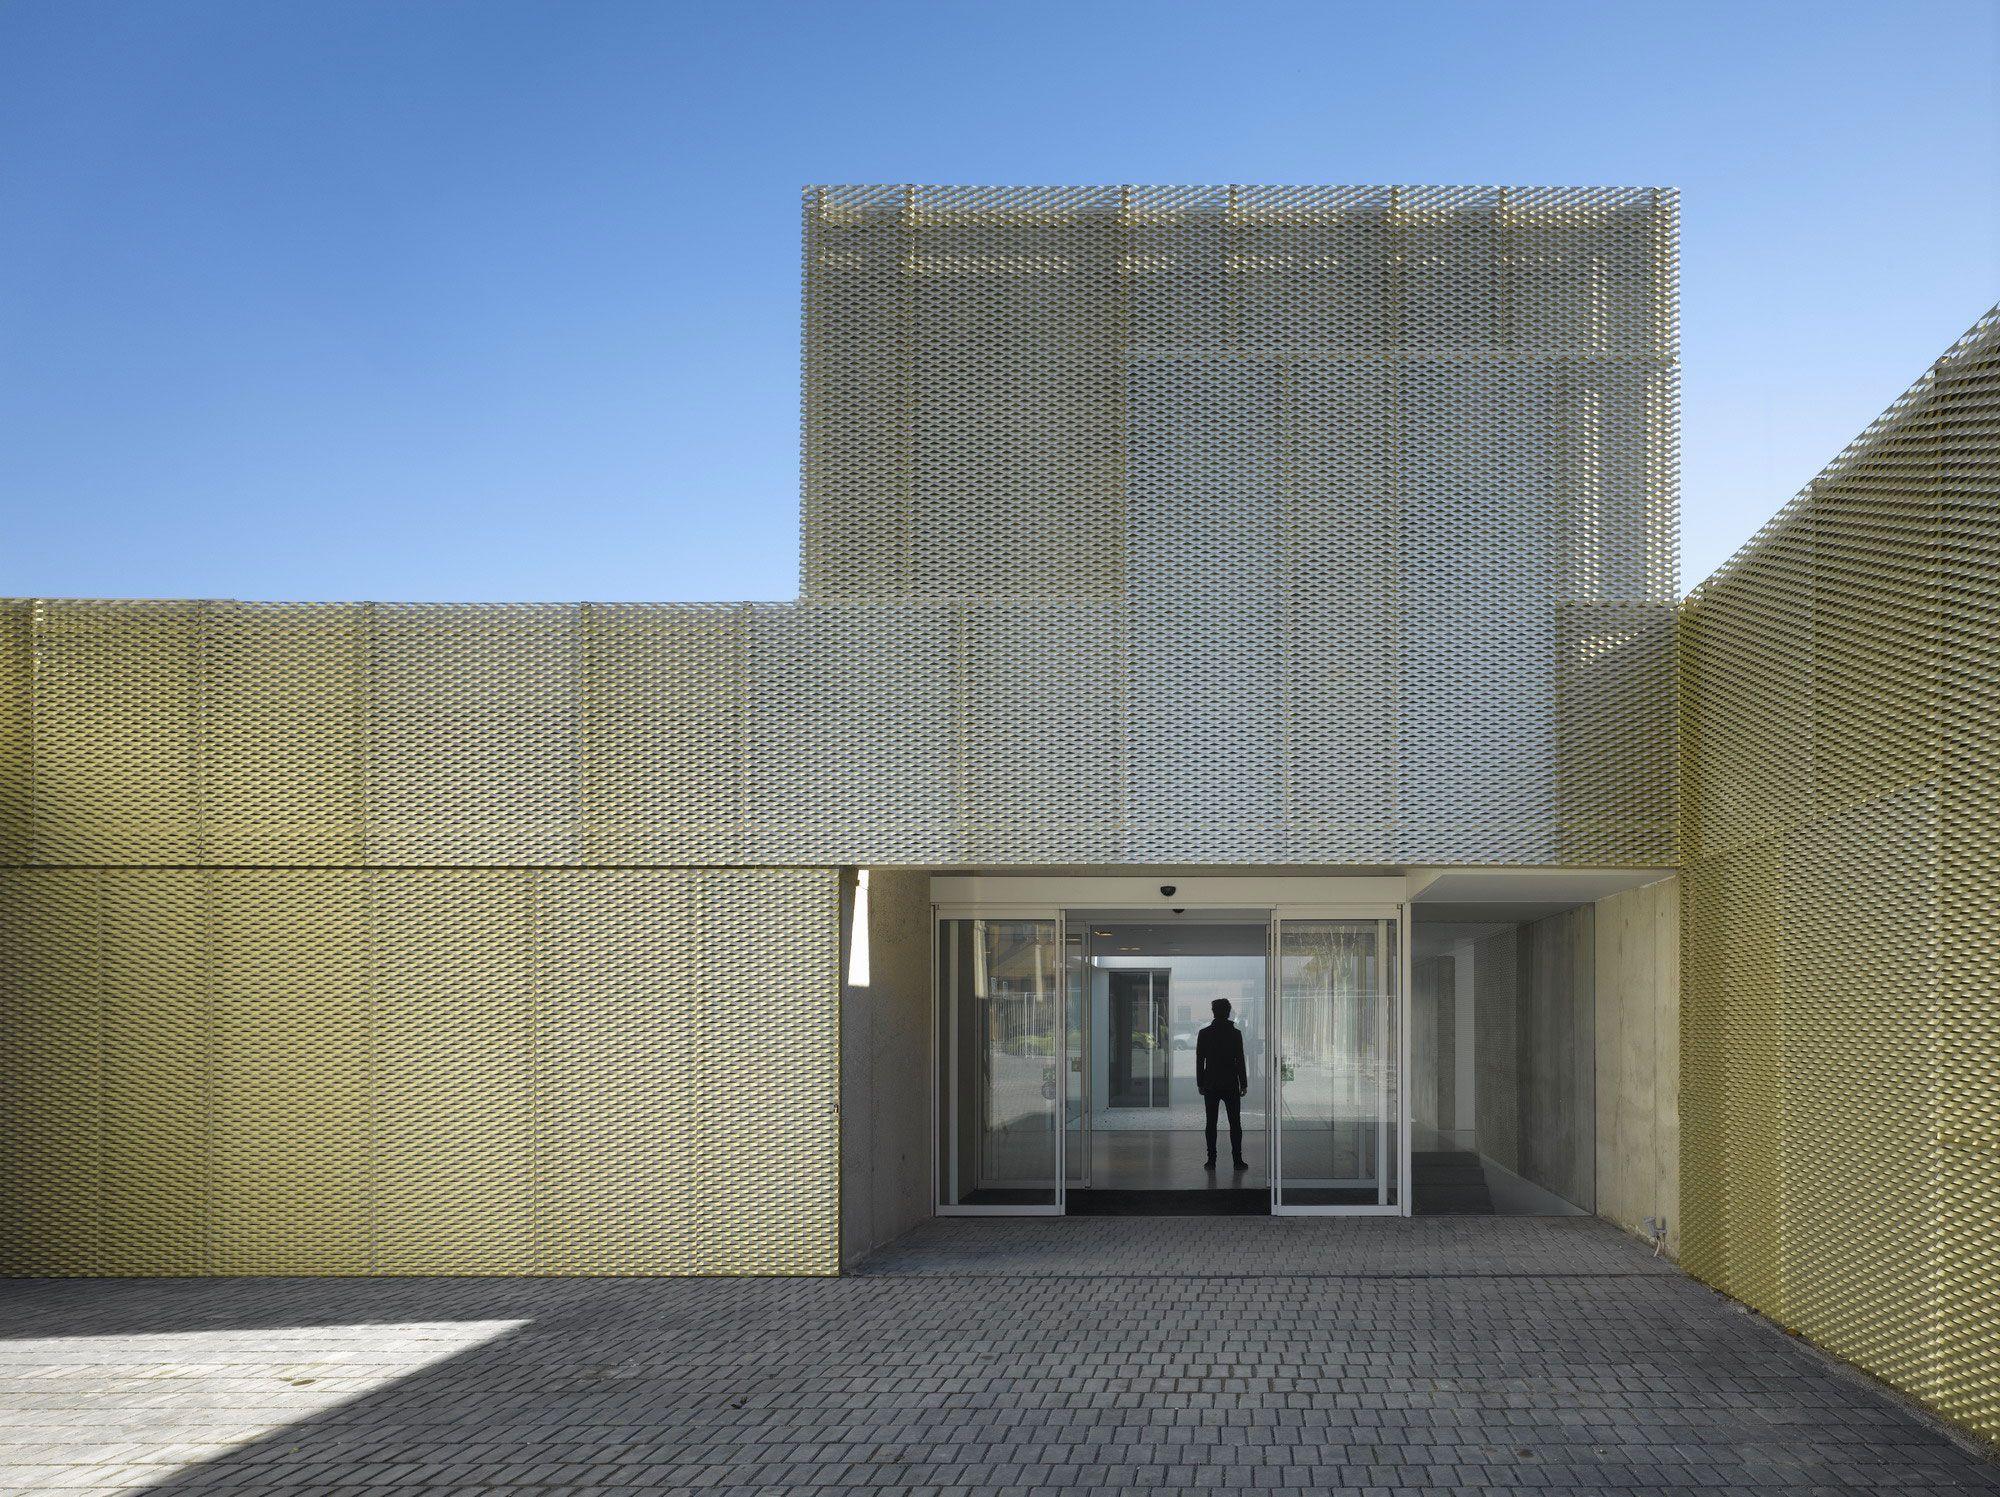 Municipal Health-care center in Usera by ESTUDIO ENTRESITIO